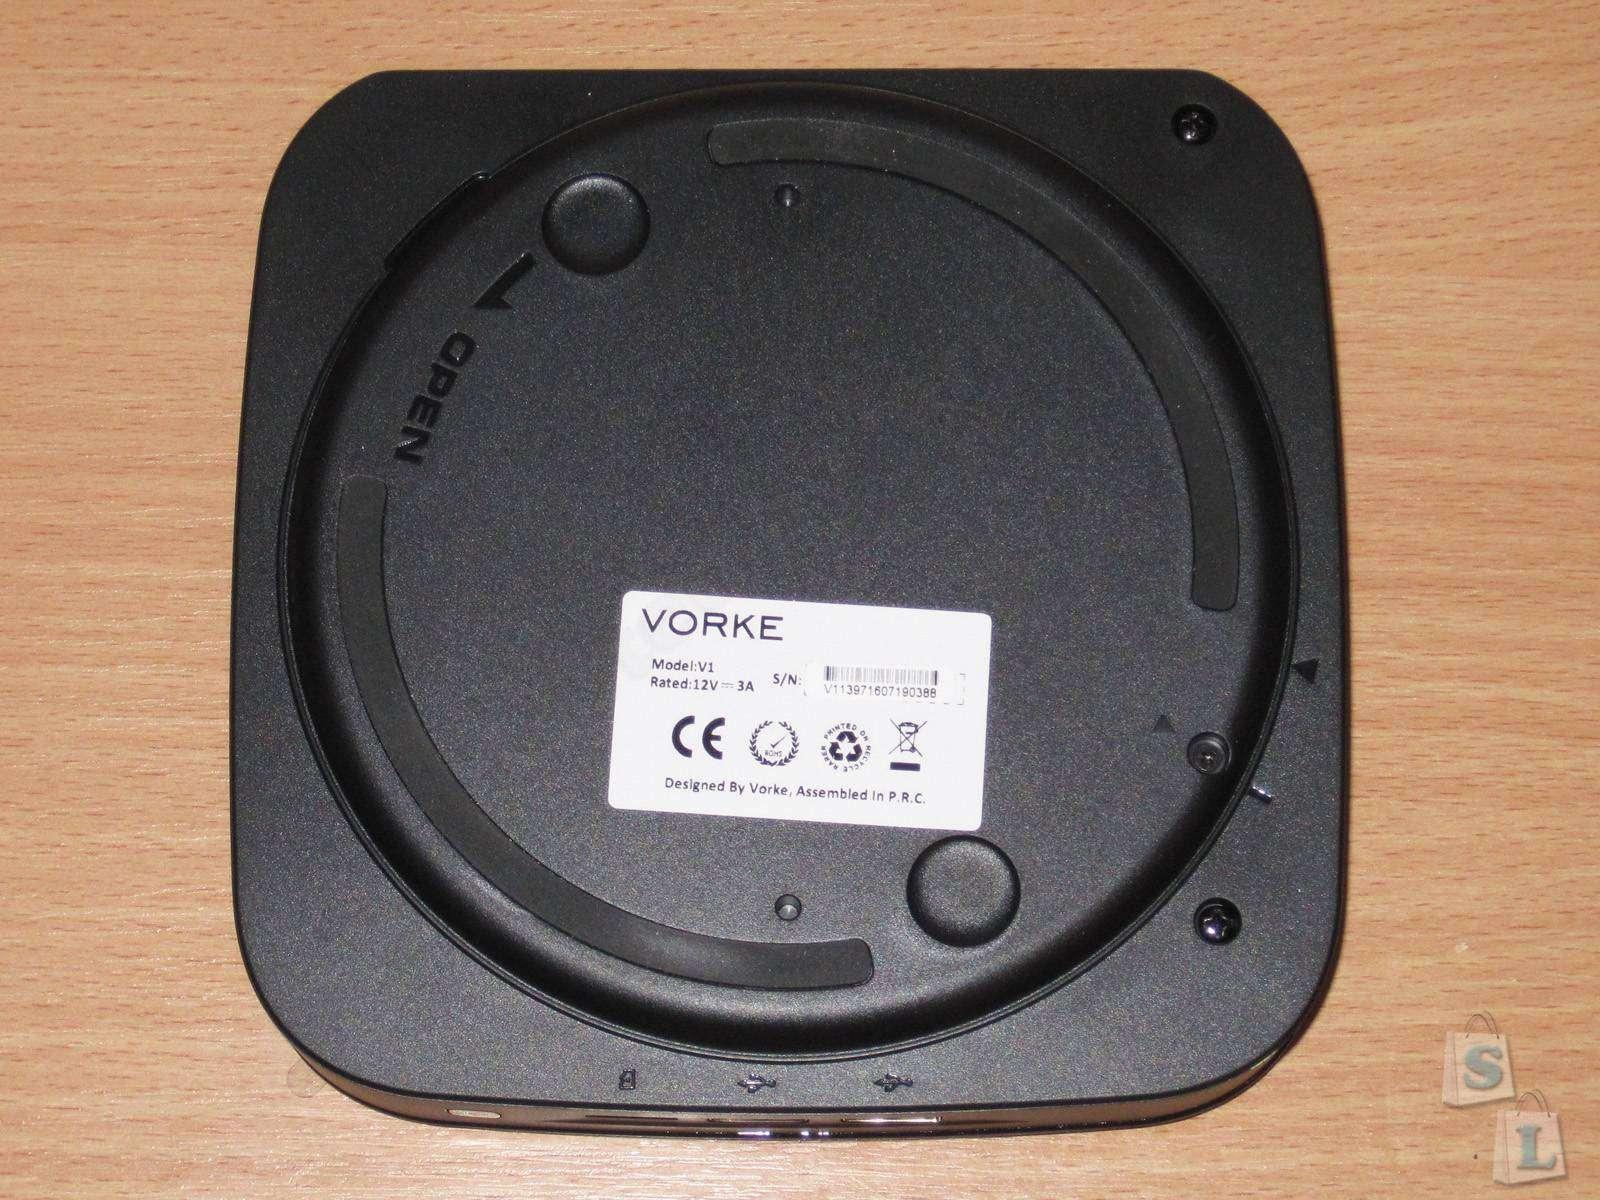 Aliexpress: Миникомпьютер Vorke V1, маленький трудяжка